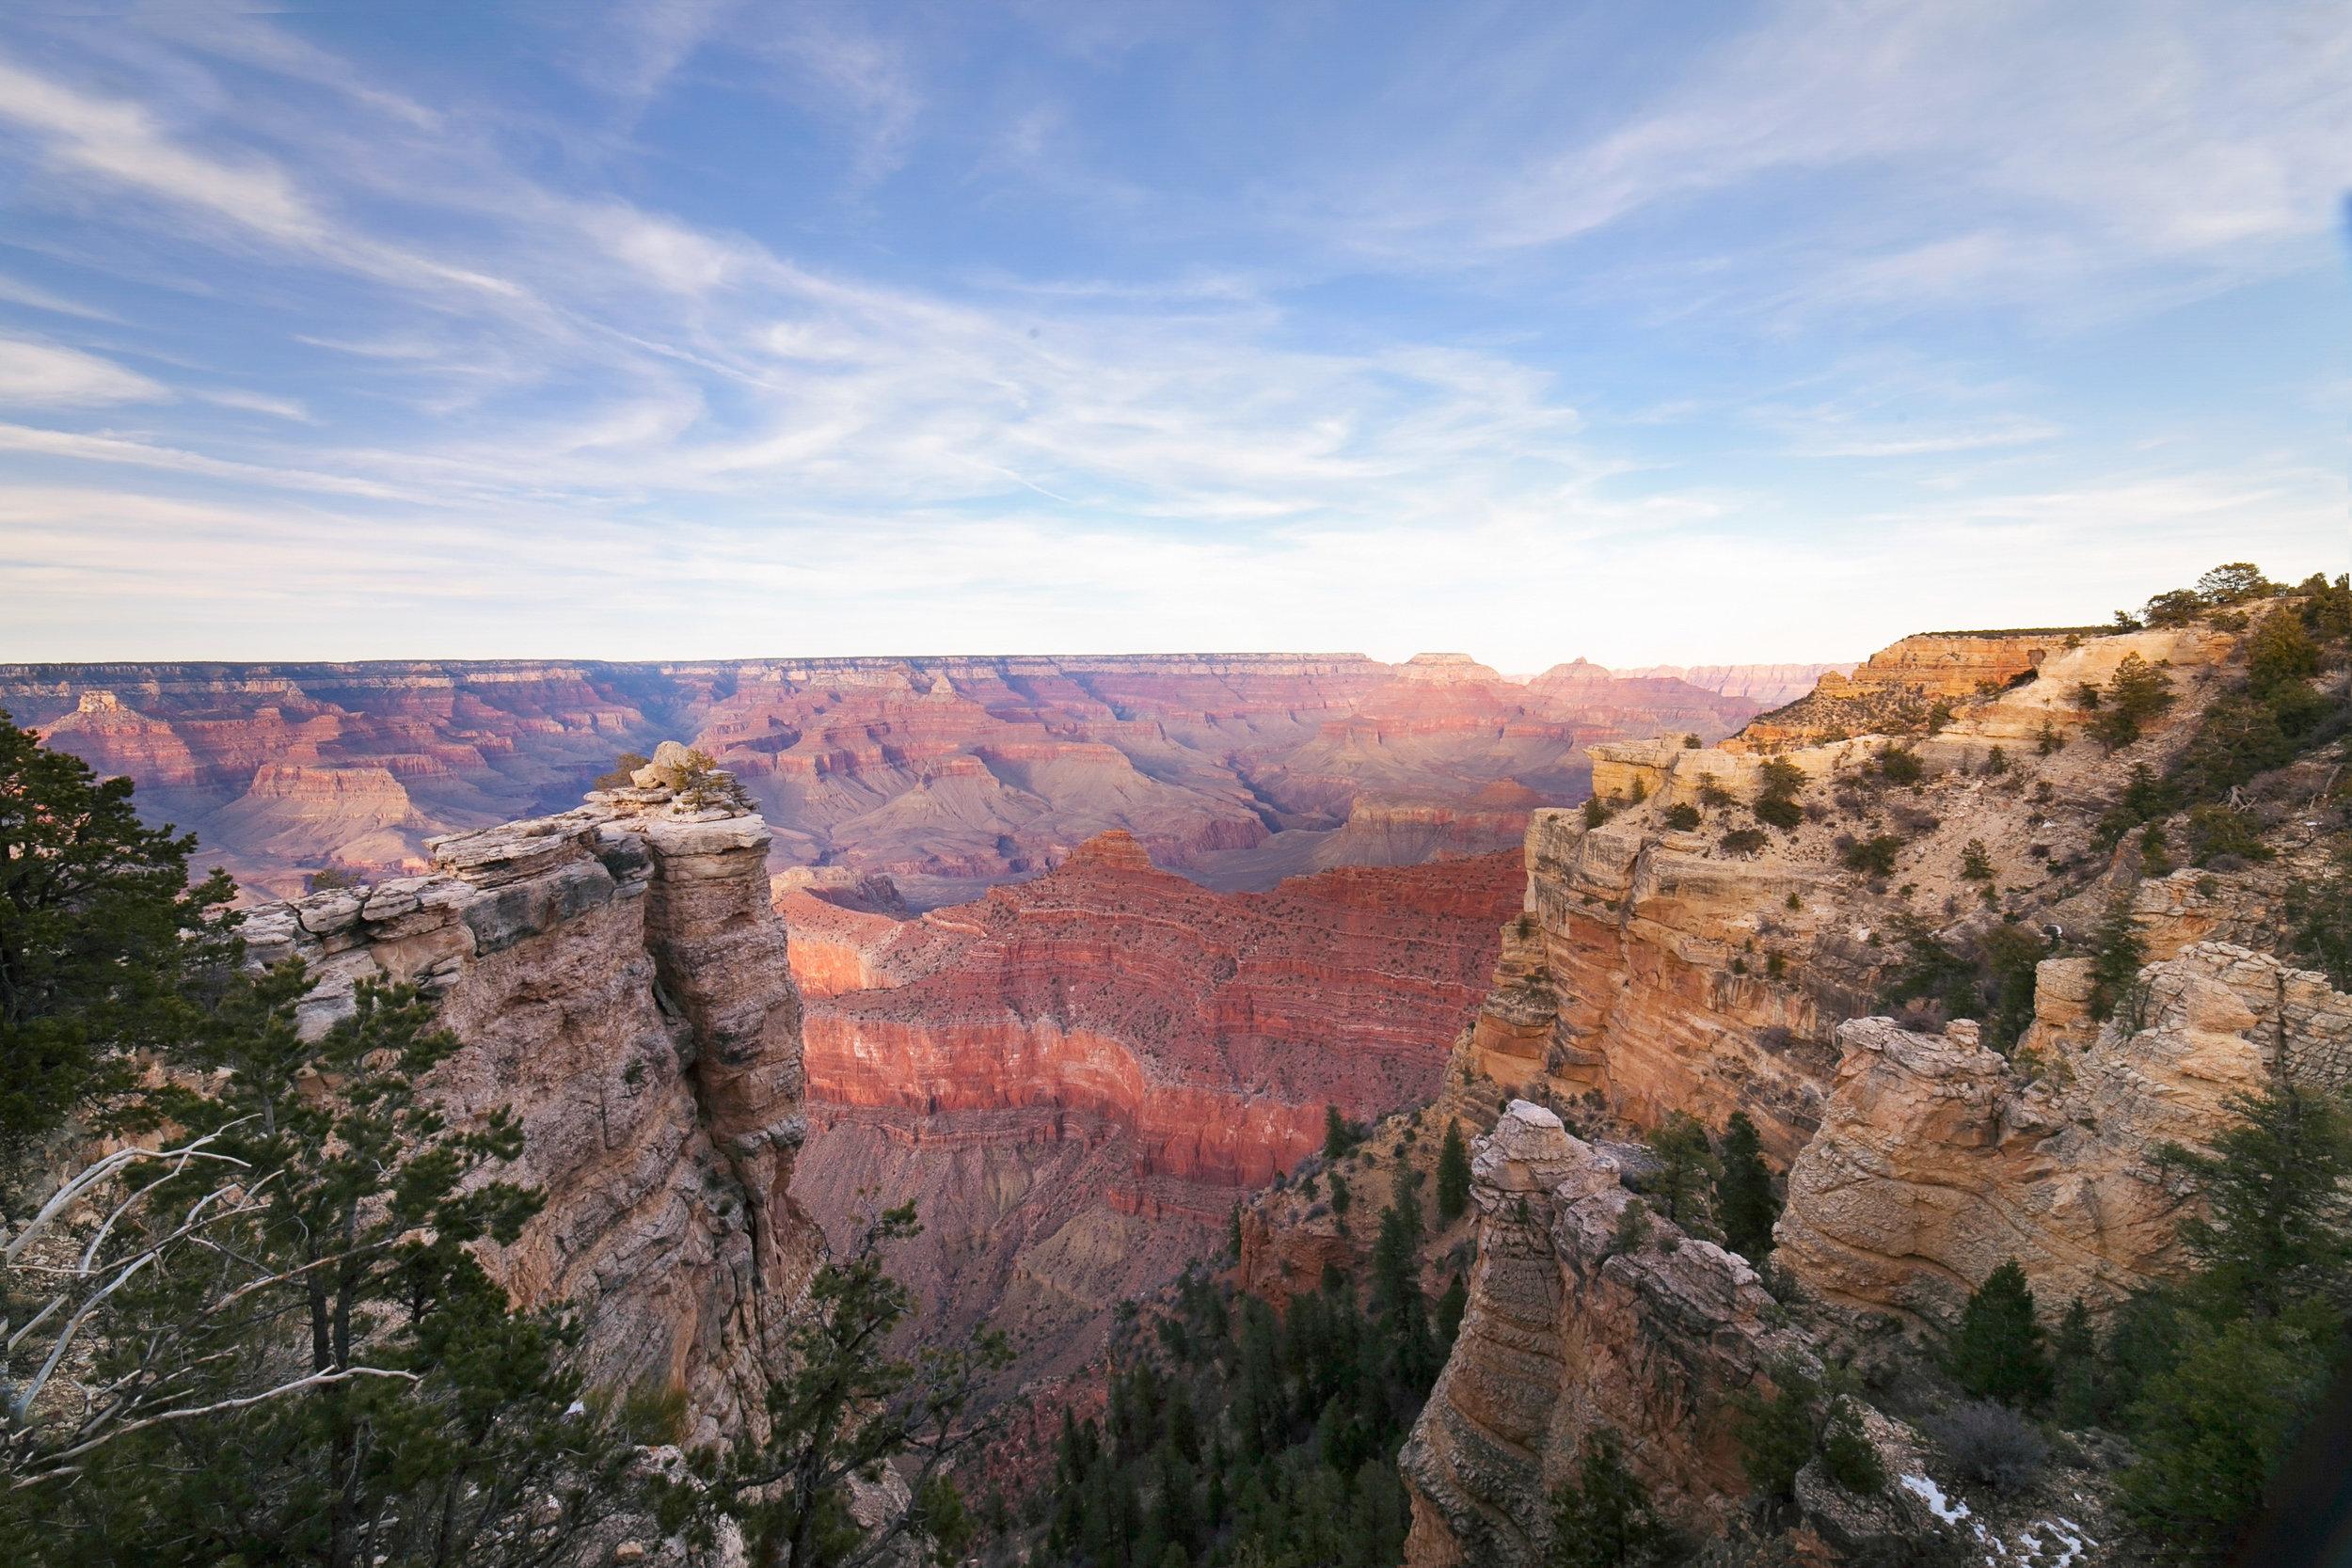 039Travel_Adventure_Photography_Outlive_Creative_Grand_Canyon_Arizona.jpg